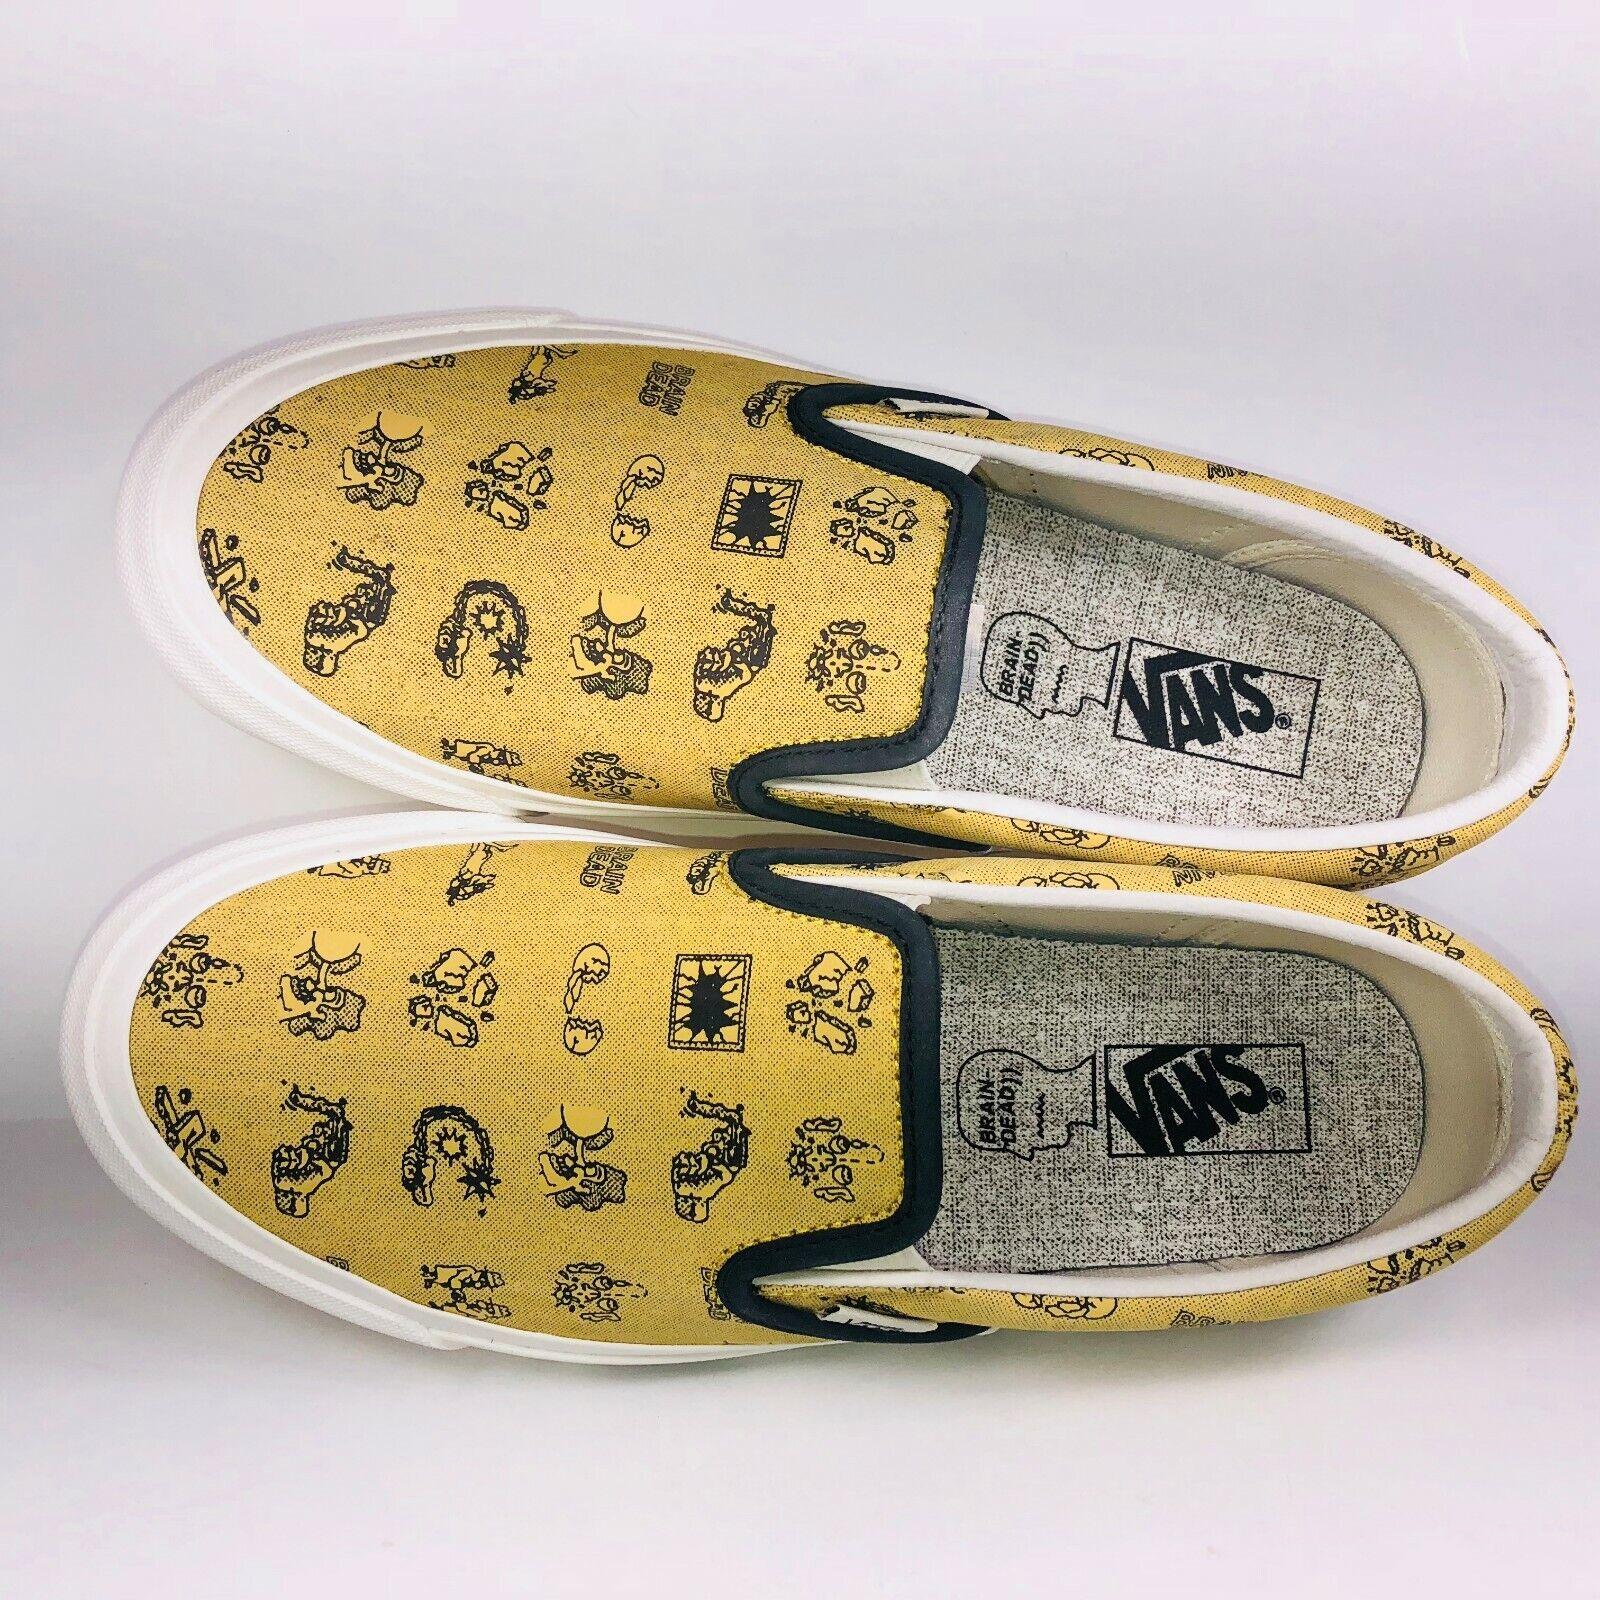 VANS Brain Dead Classic Slip On LX Aspen gold White shoes VN0A38FJN8B Size 8